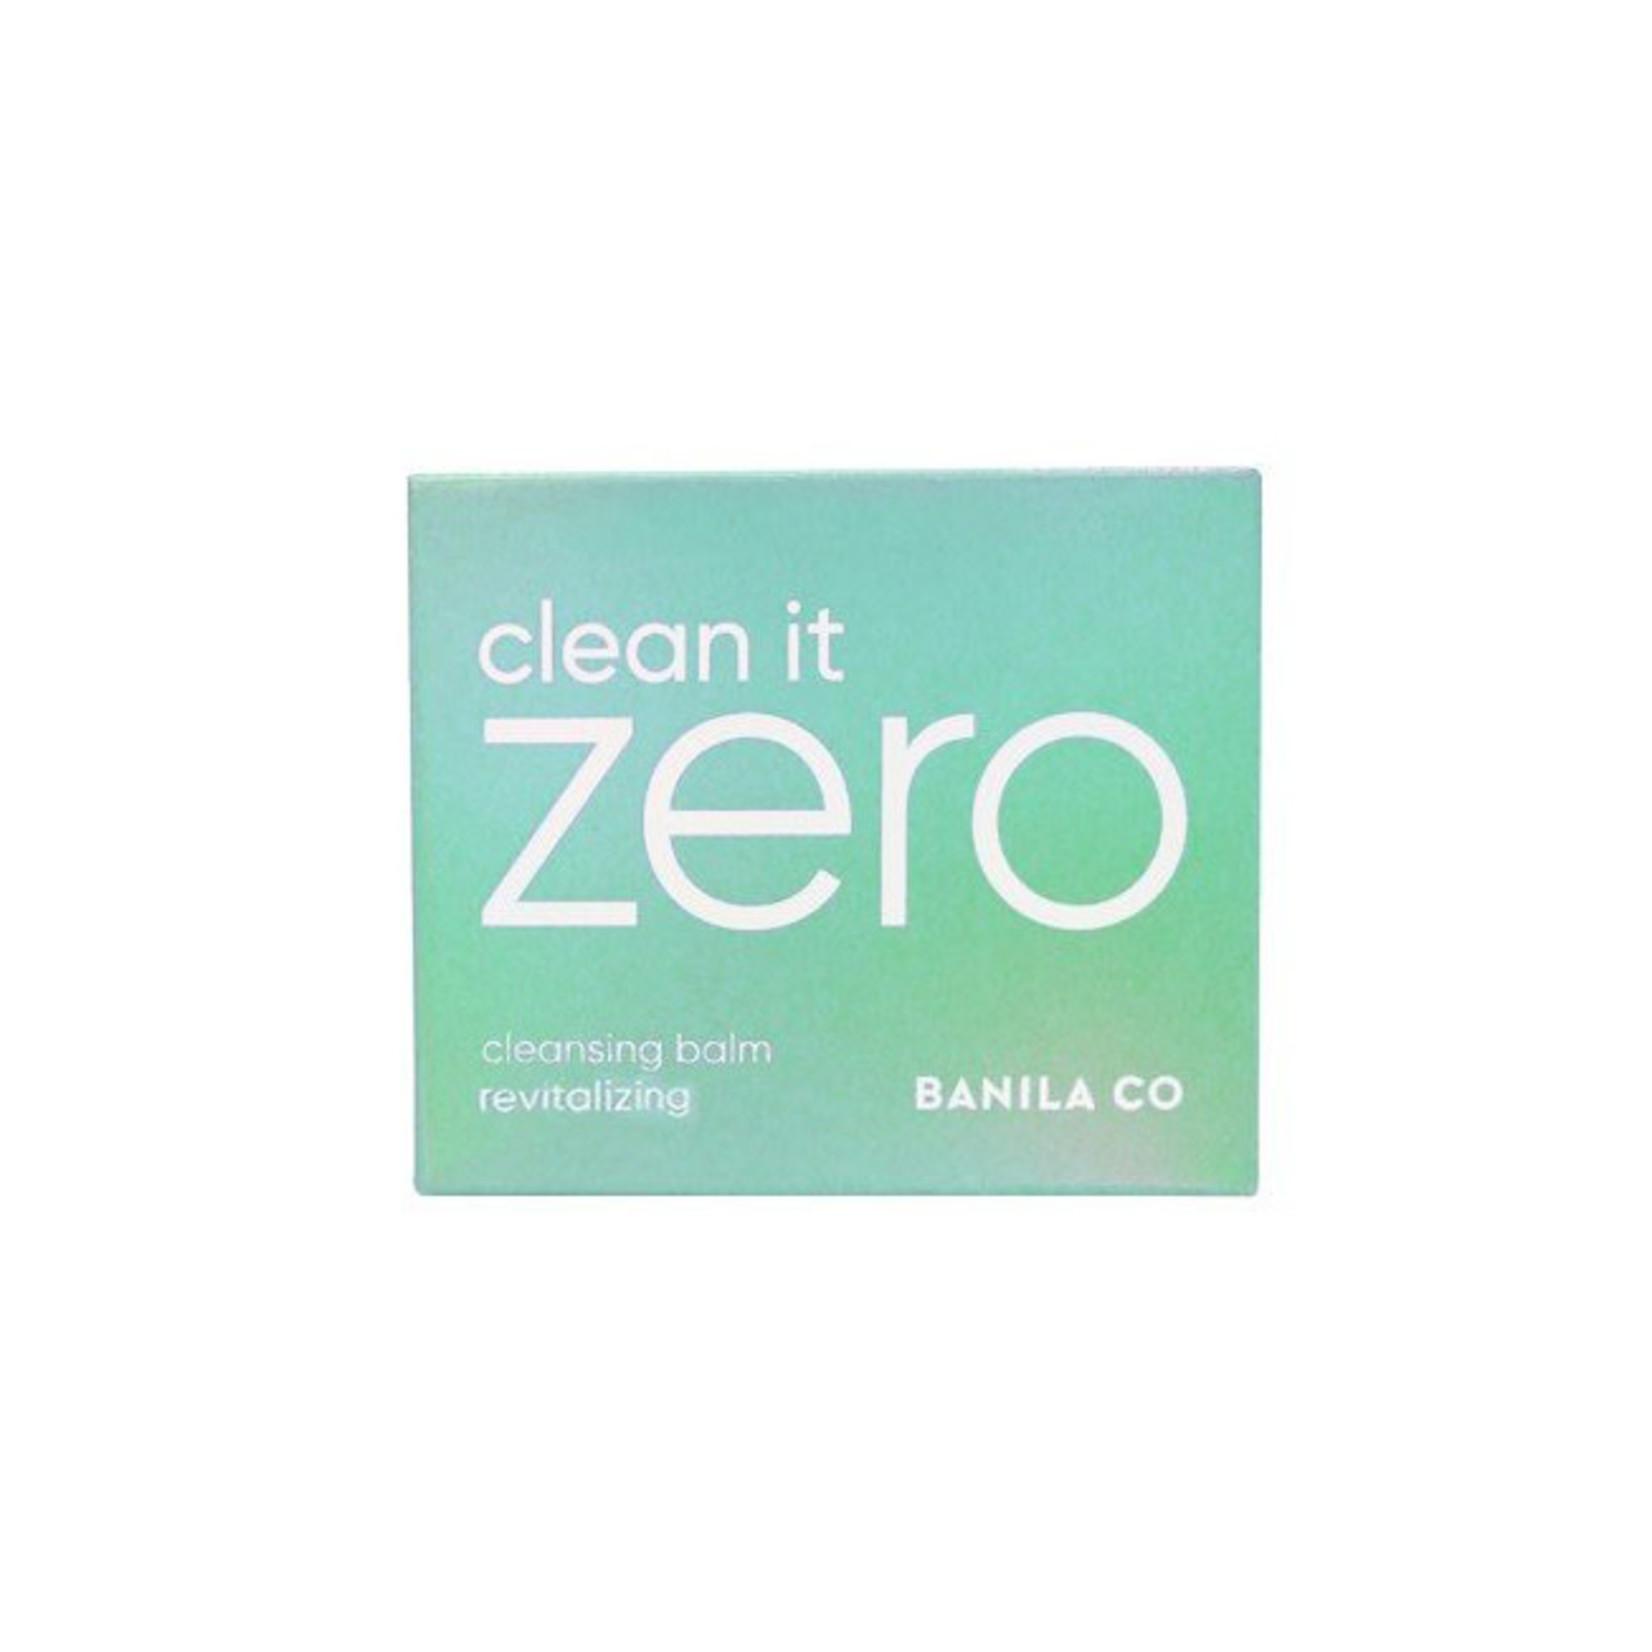 Banila Co. Banila Co Clean it Zero Cleansing Balm Revitalizing 100ml - For Oily Skin